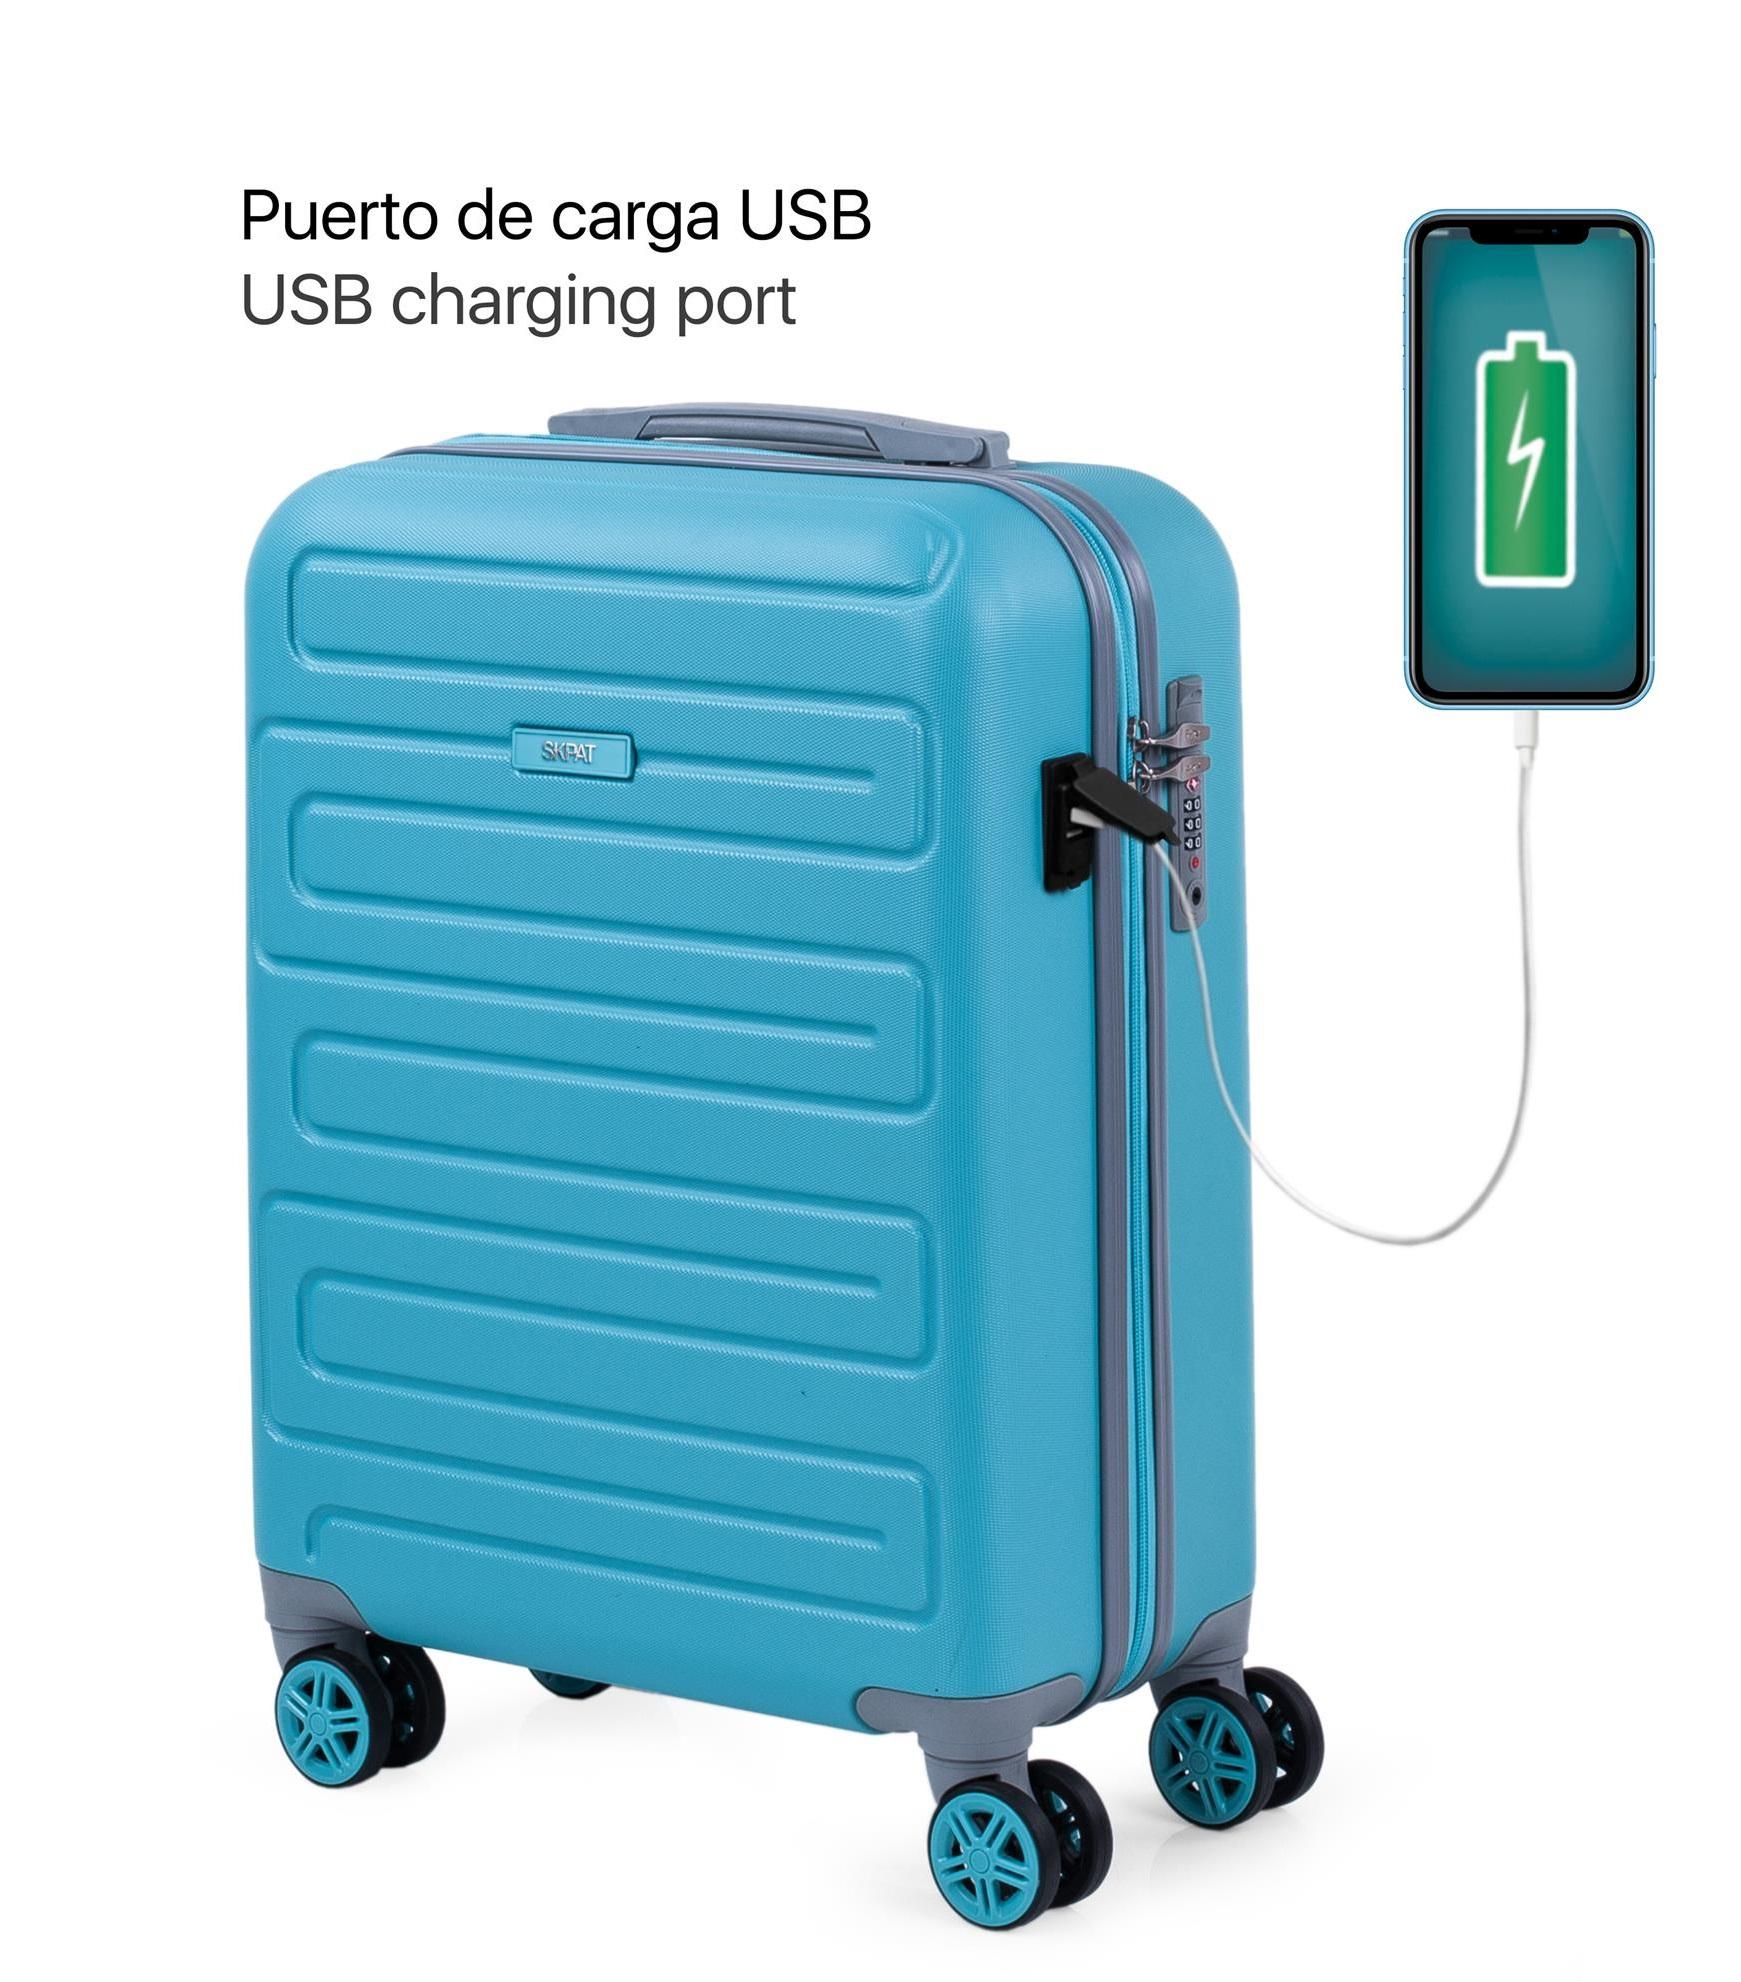 17505001 Maleta Cabina con puerto usb skpat mónaco turquesa